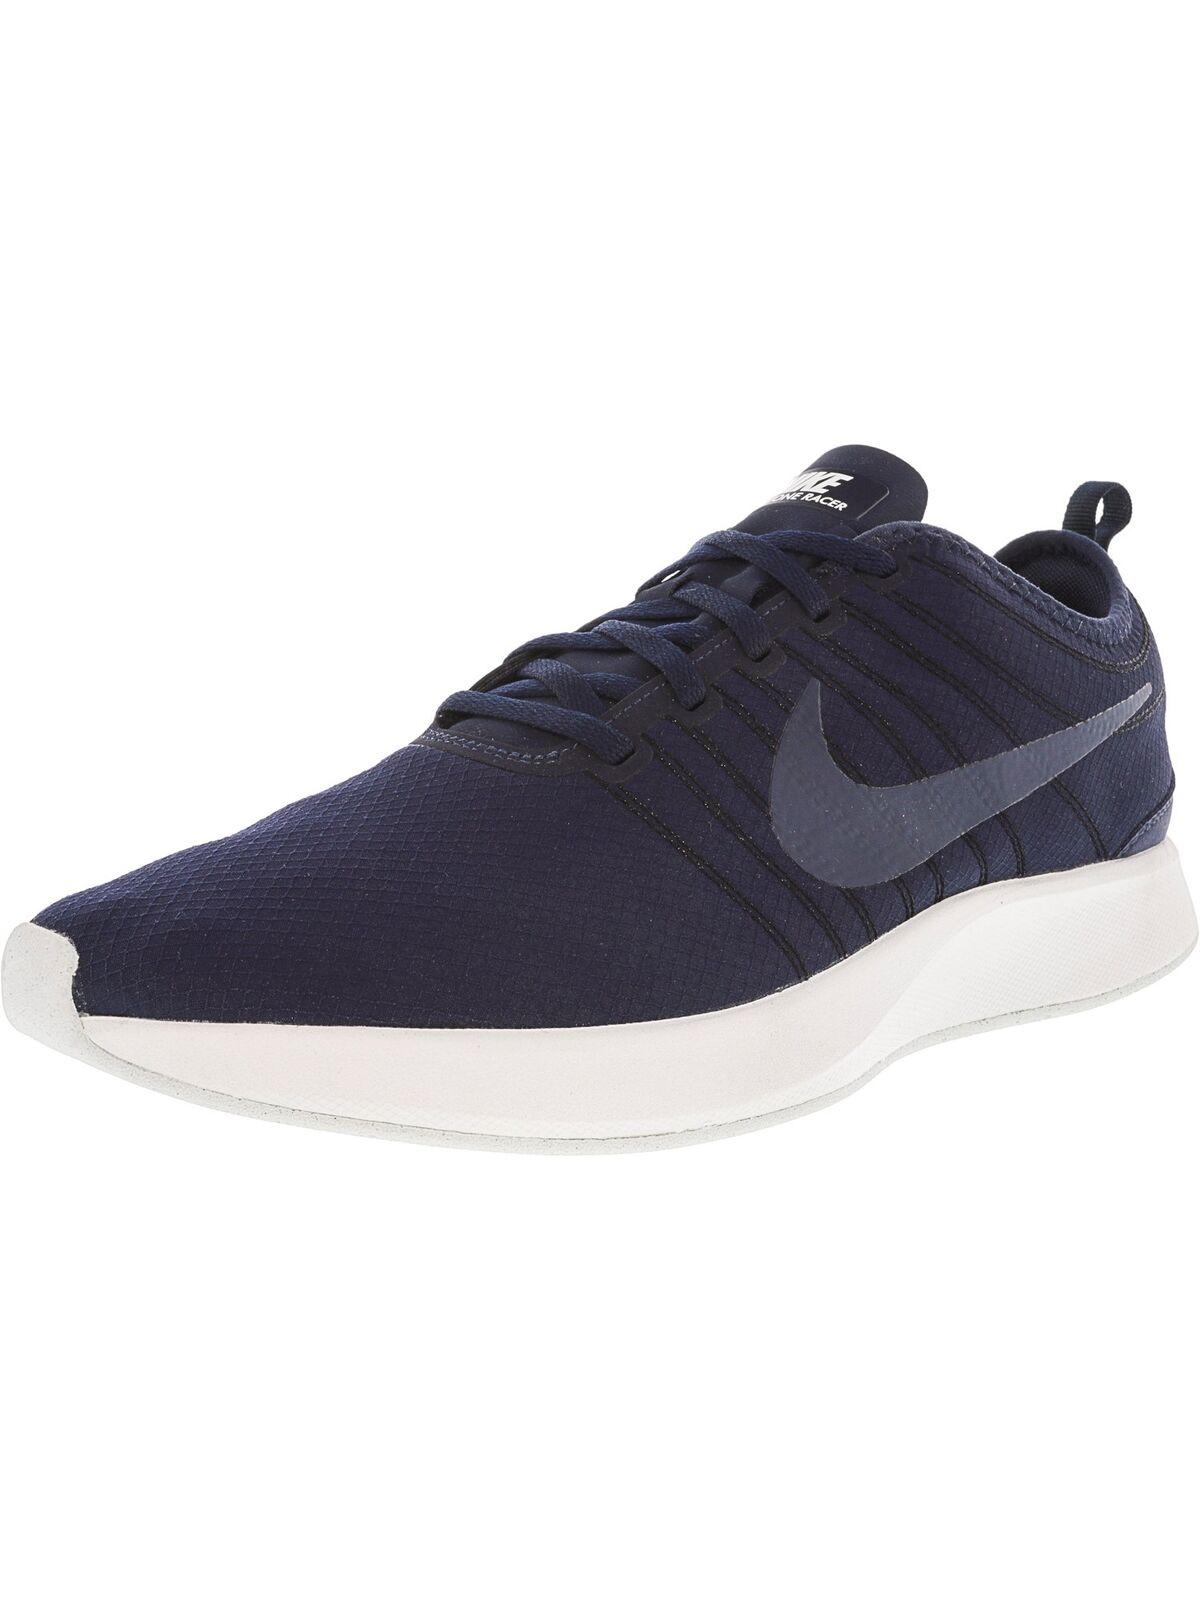 Nike Men's Dualtone Racer Se Ankle-High Running shoes